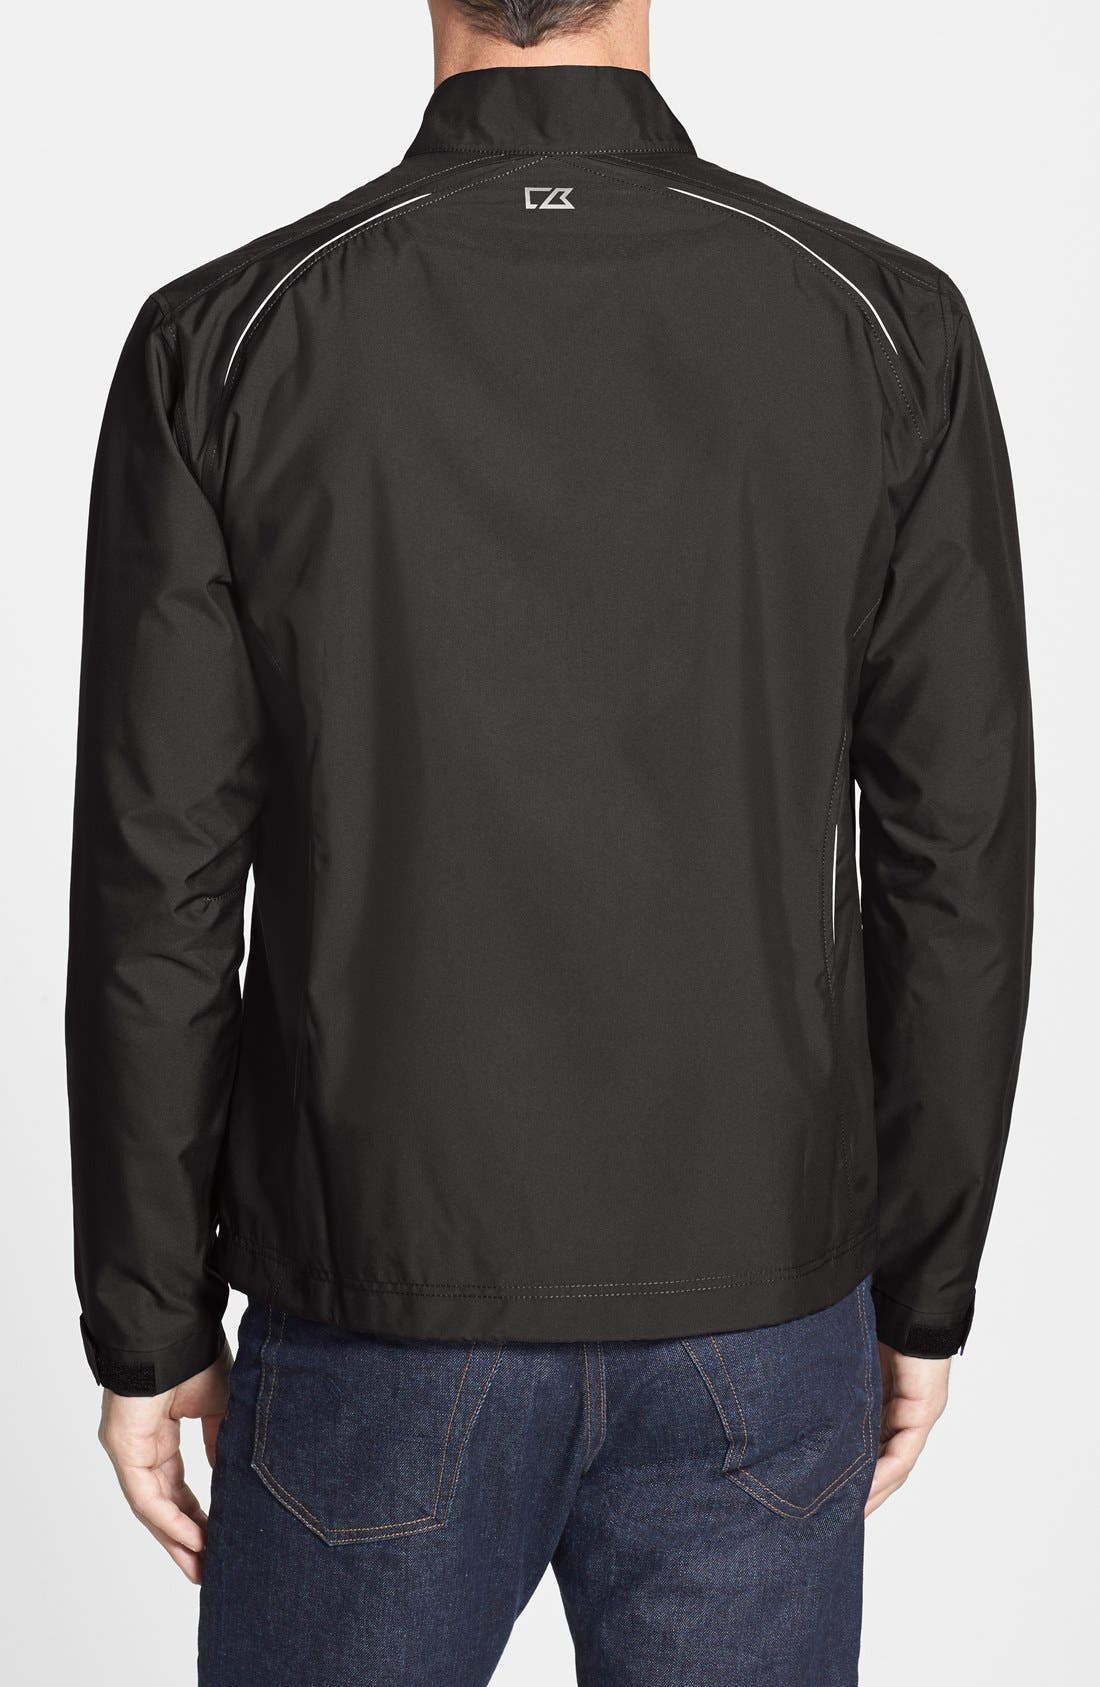 Baltimore Ravens - Beacon WeatherTec Wind & Water Resistant Jacket,                             Alternate thumbnail 3, color,                             001